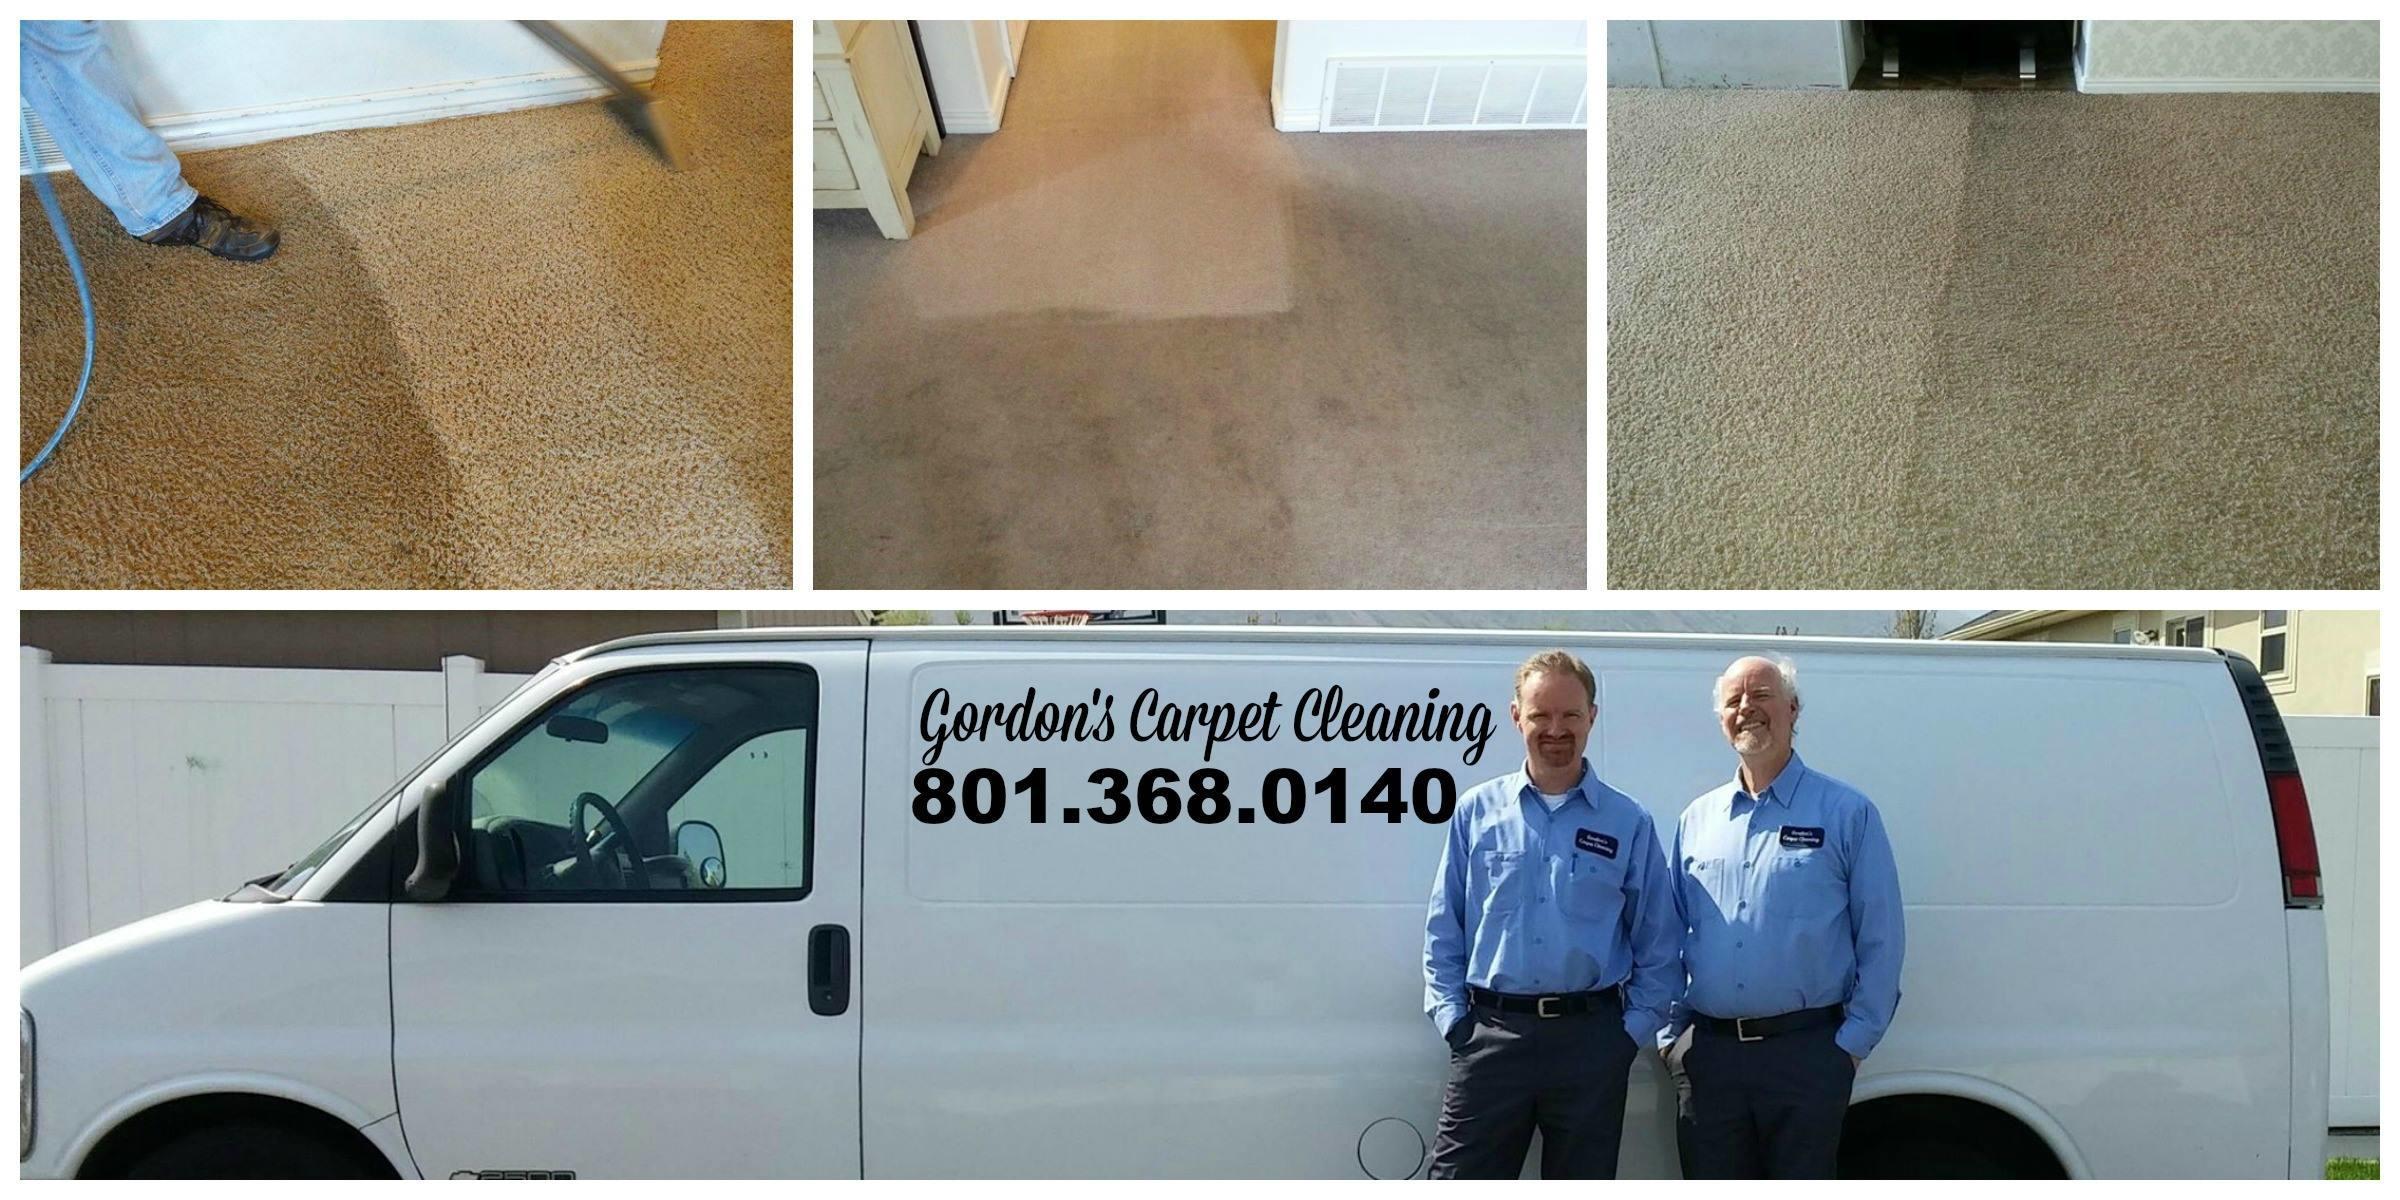 Gordon's Carpet Cleaning image 0